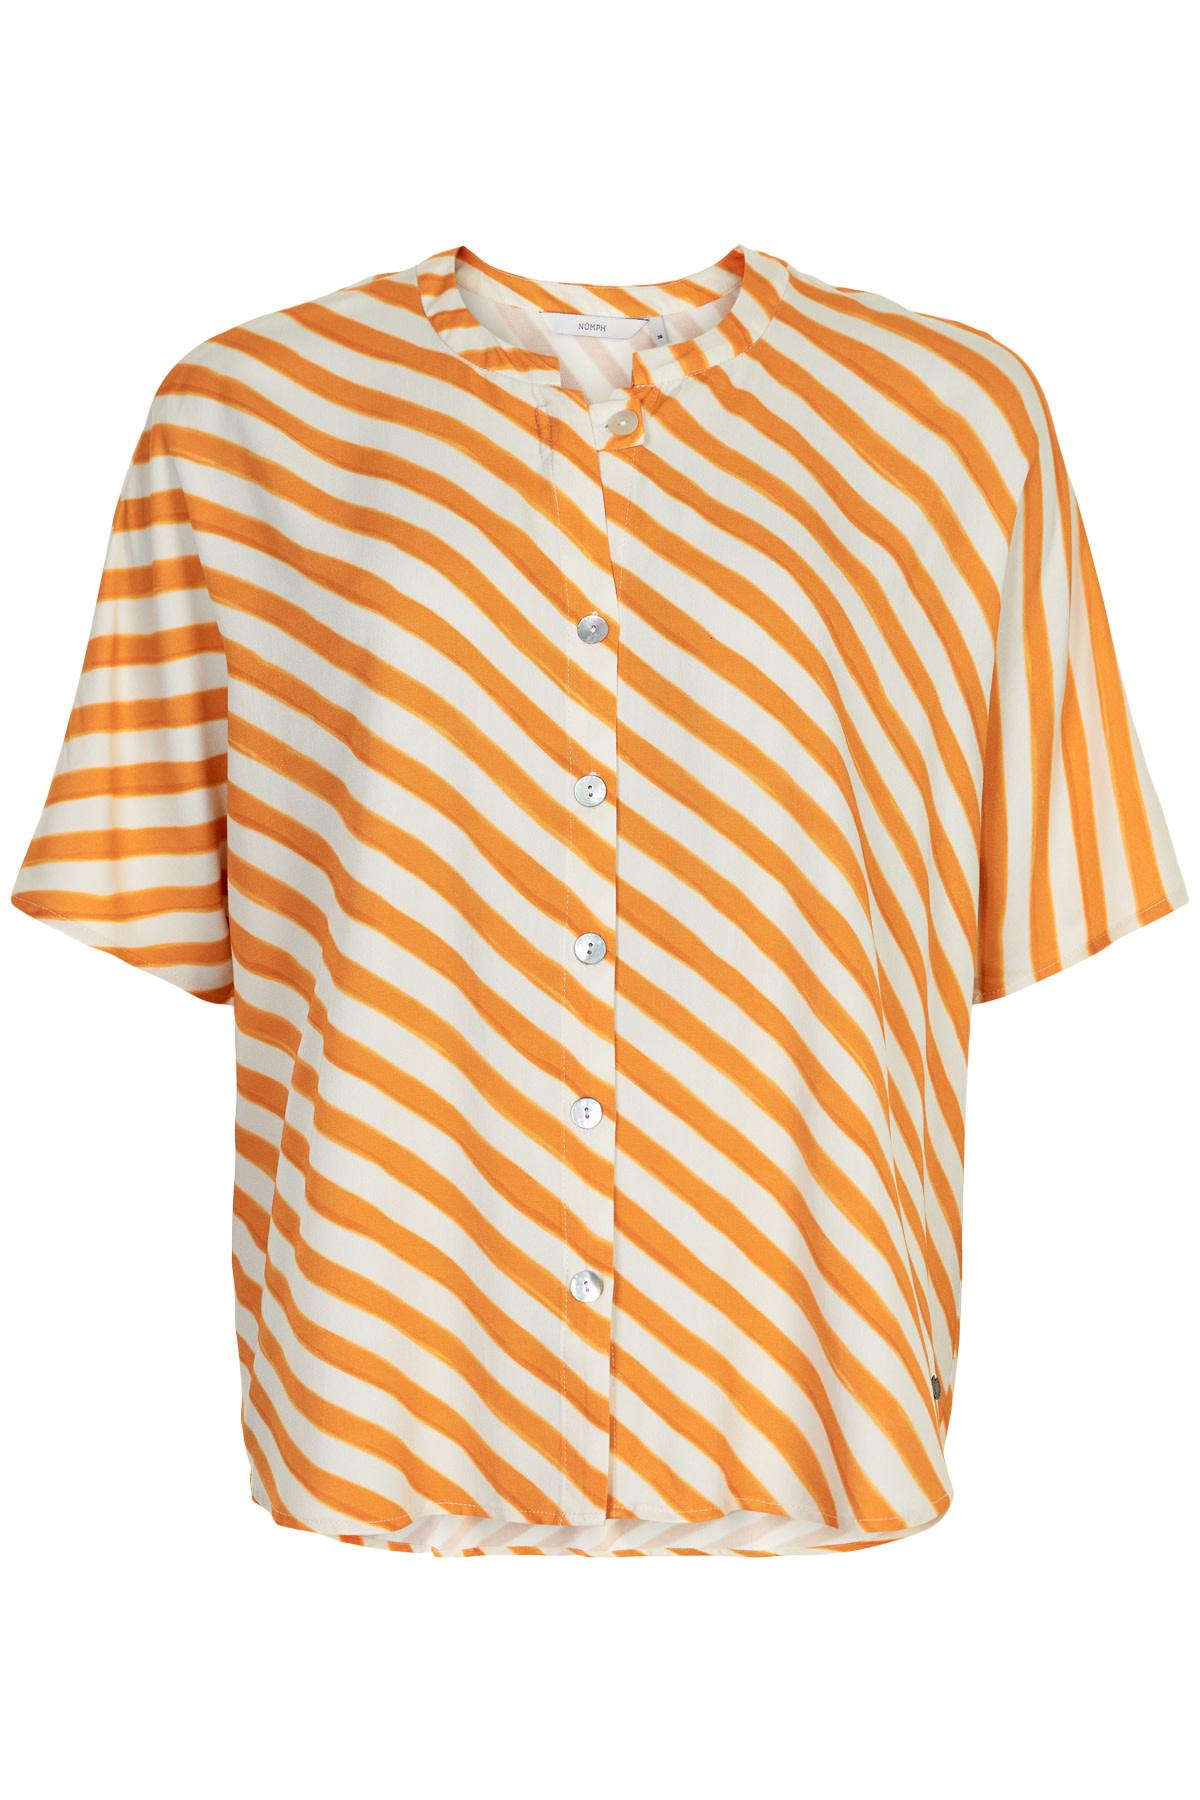 Nümph Brenda Shirt